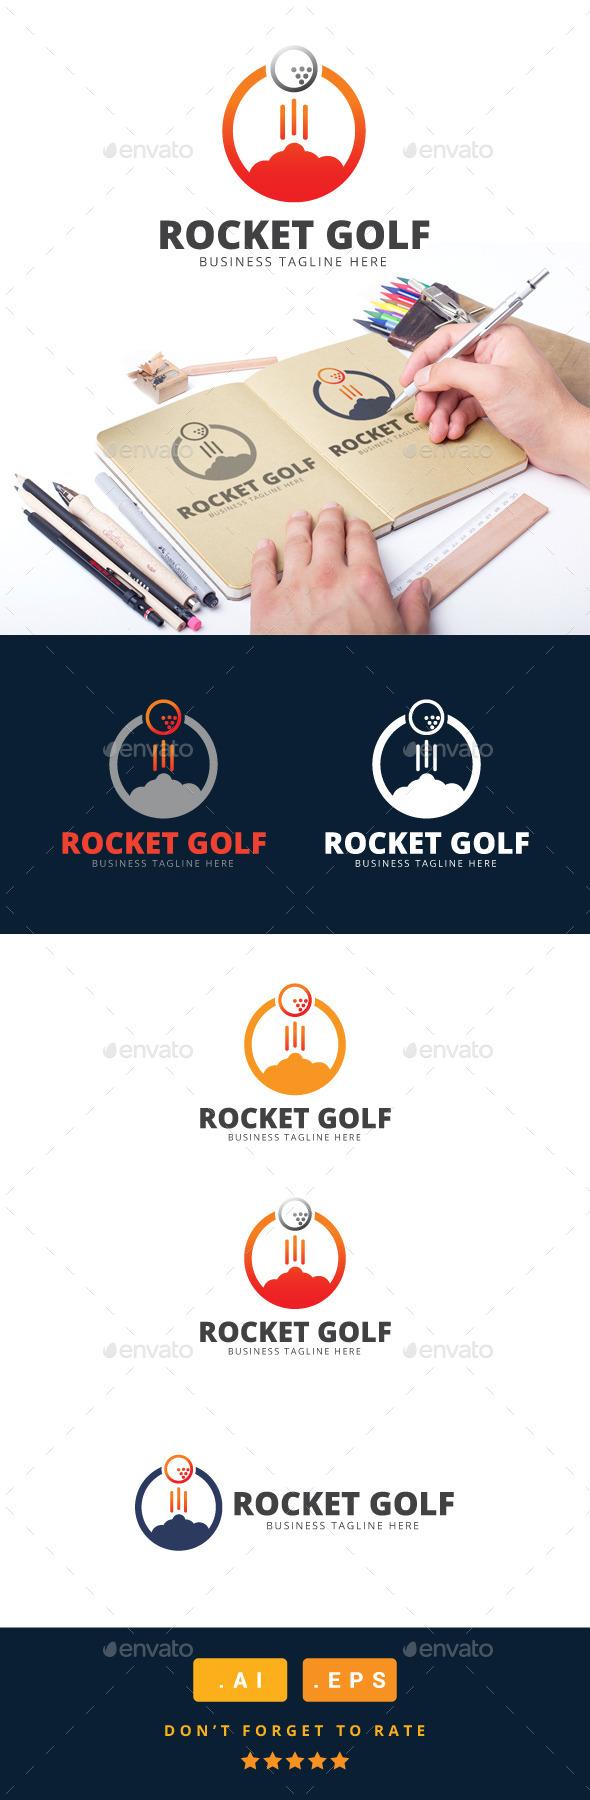 GraphicRiver Rocket Golf Logo 11031183